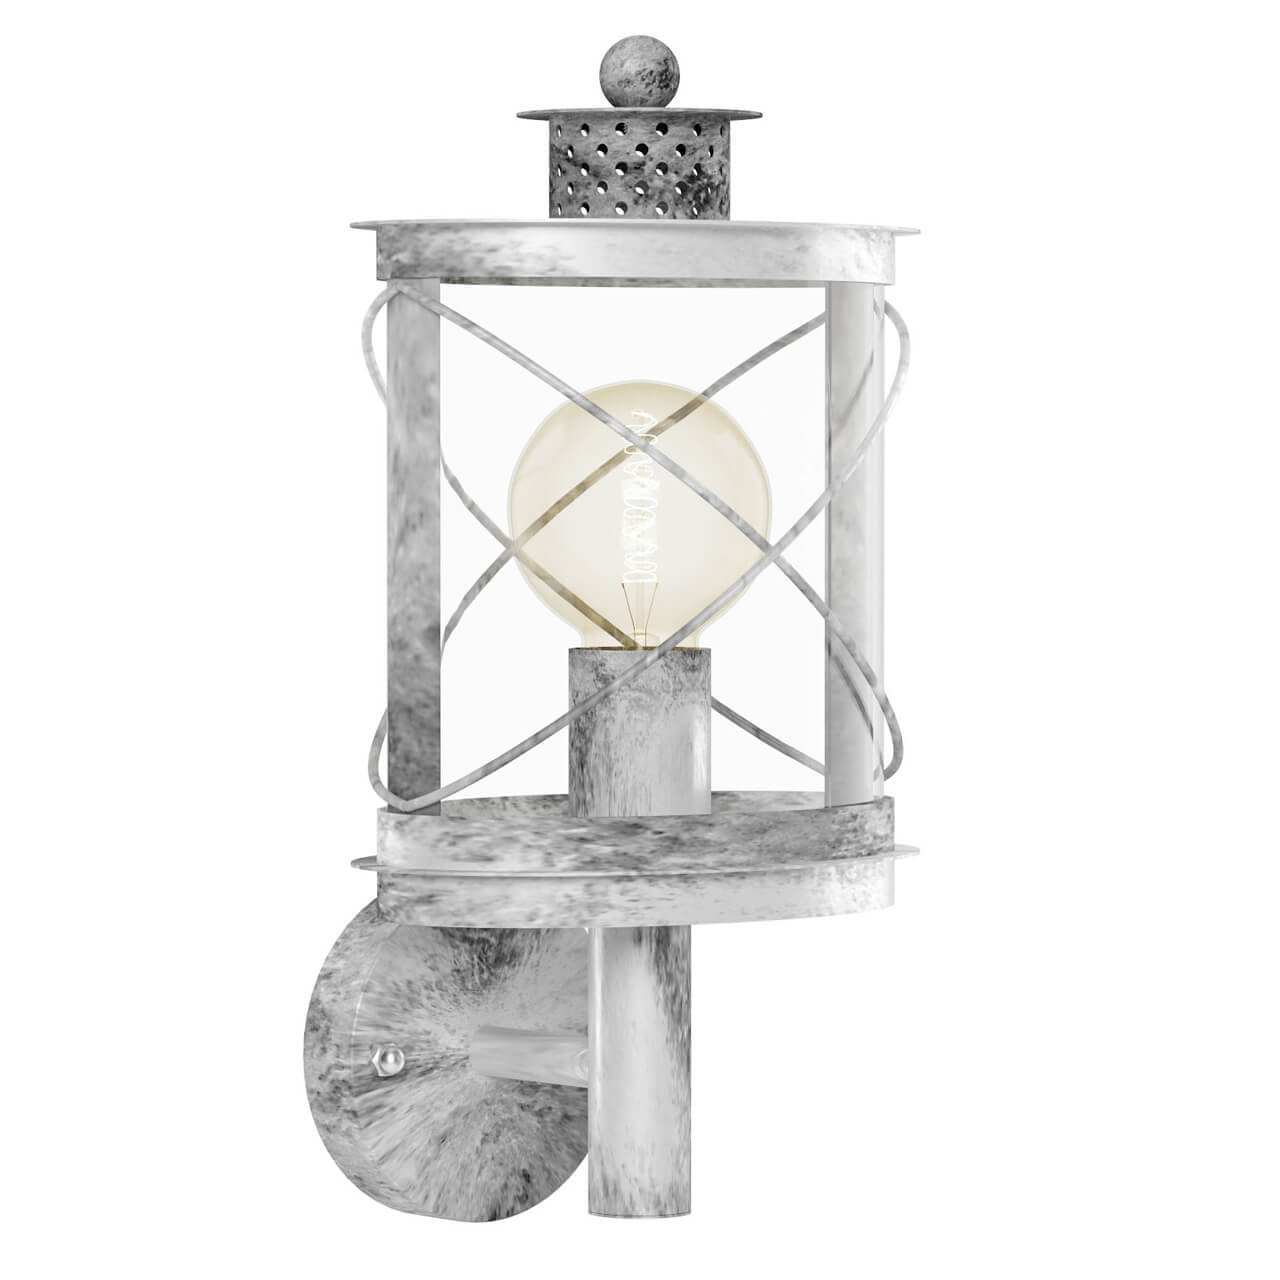 Светильник Eglo 94865 Hilburn eglo светильник уличный hilburn 94843